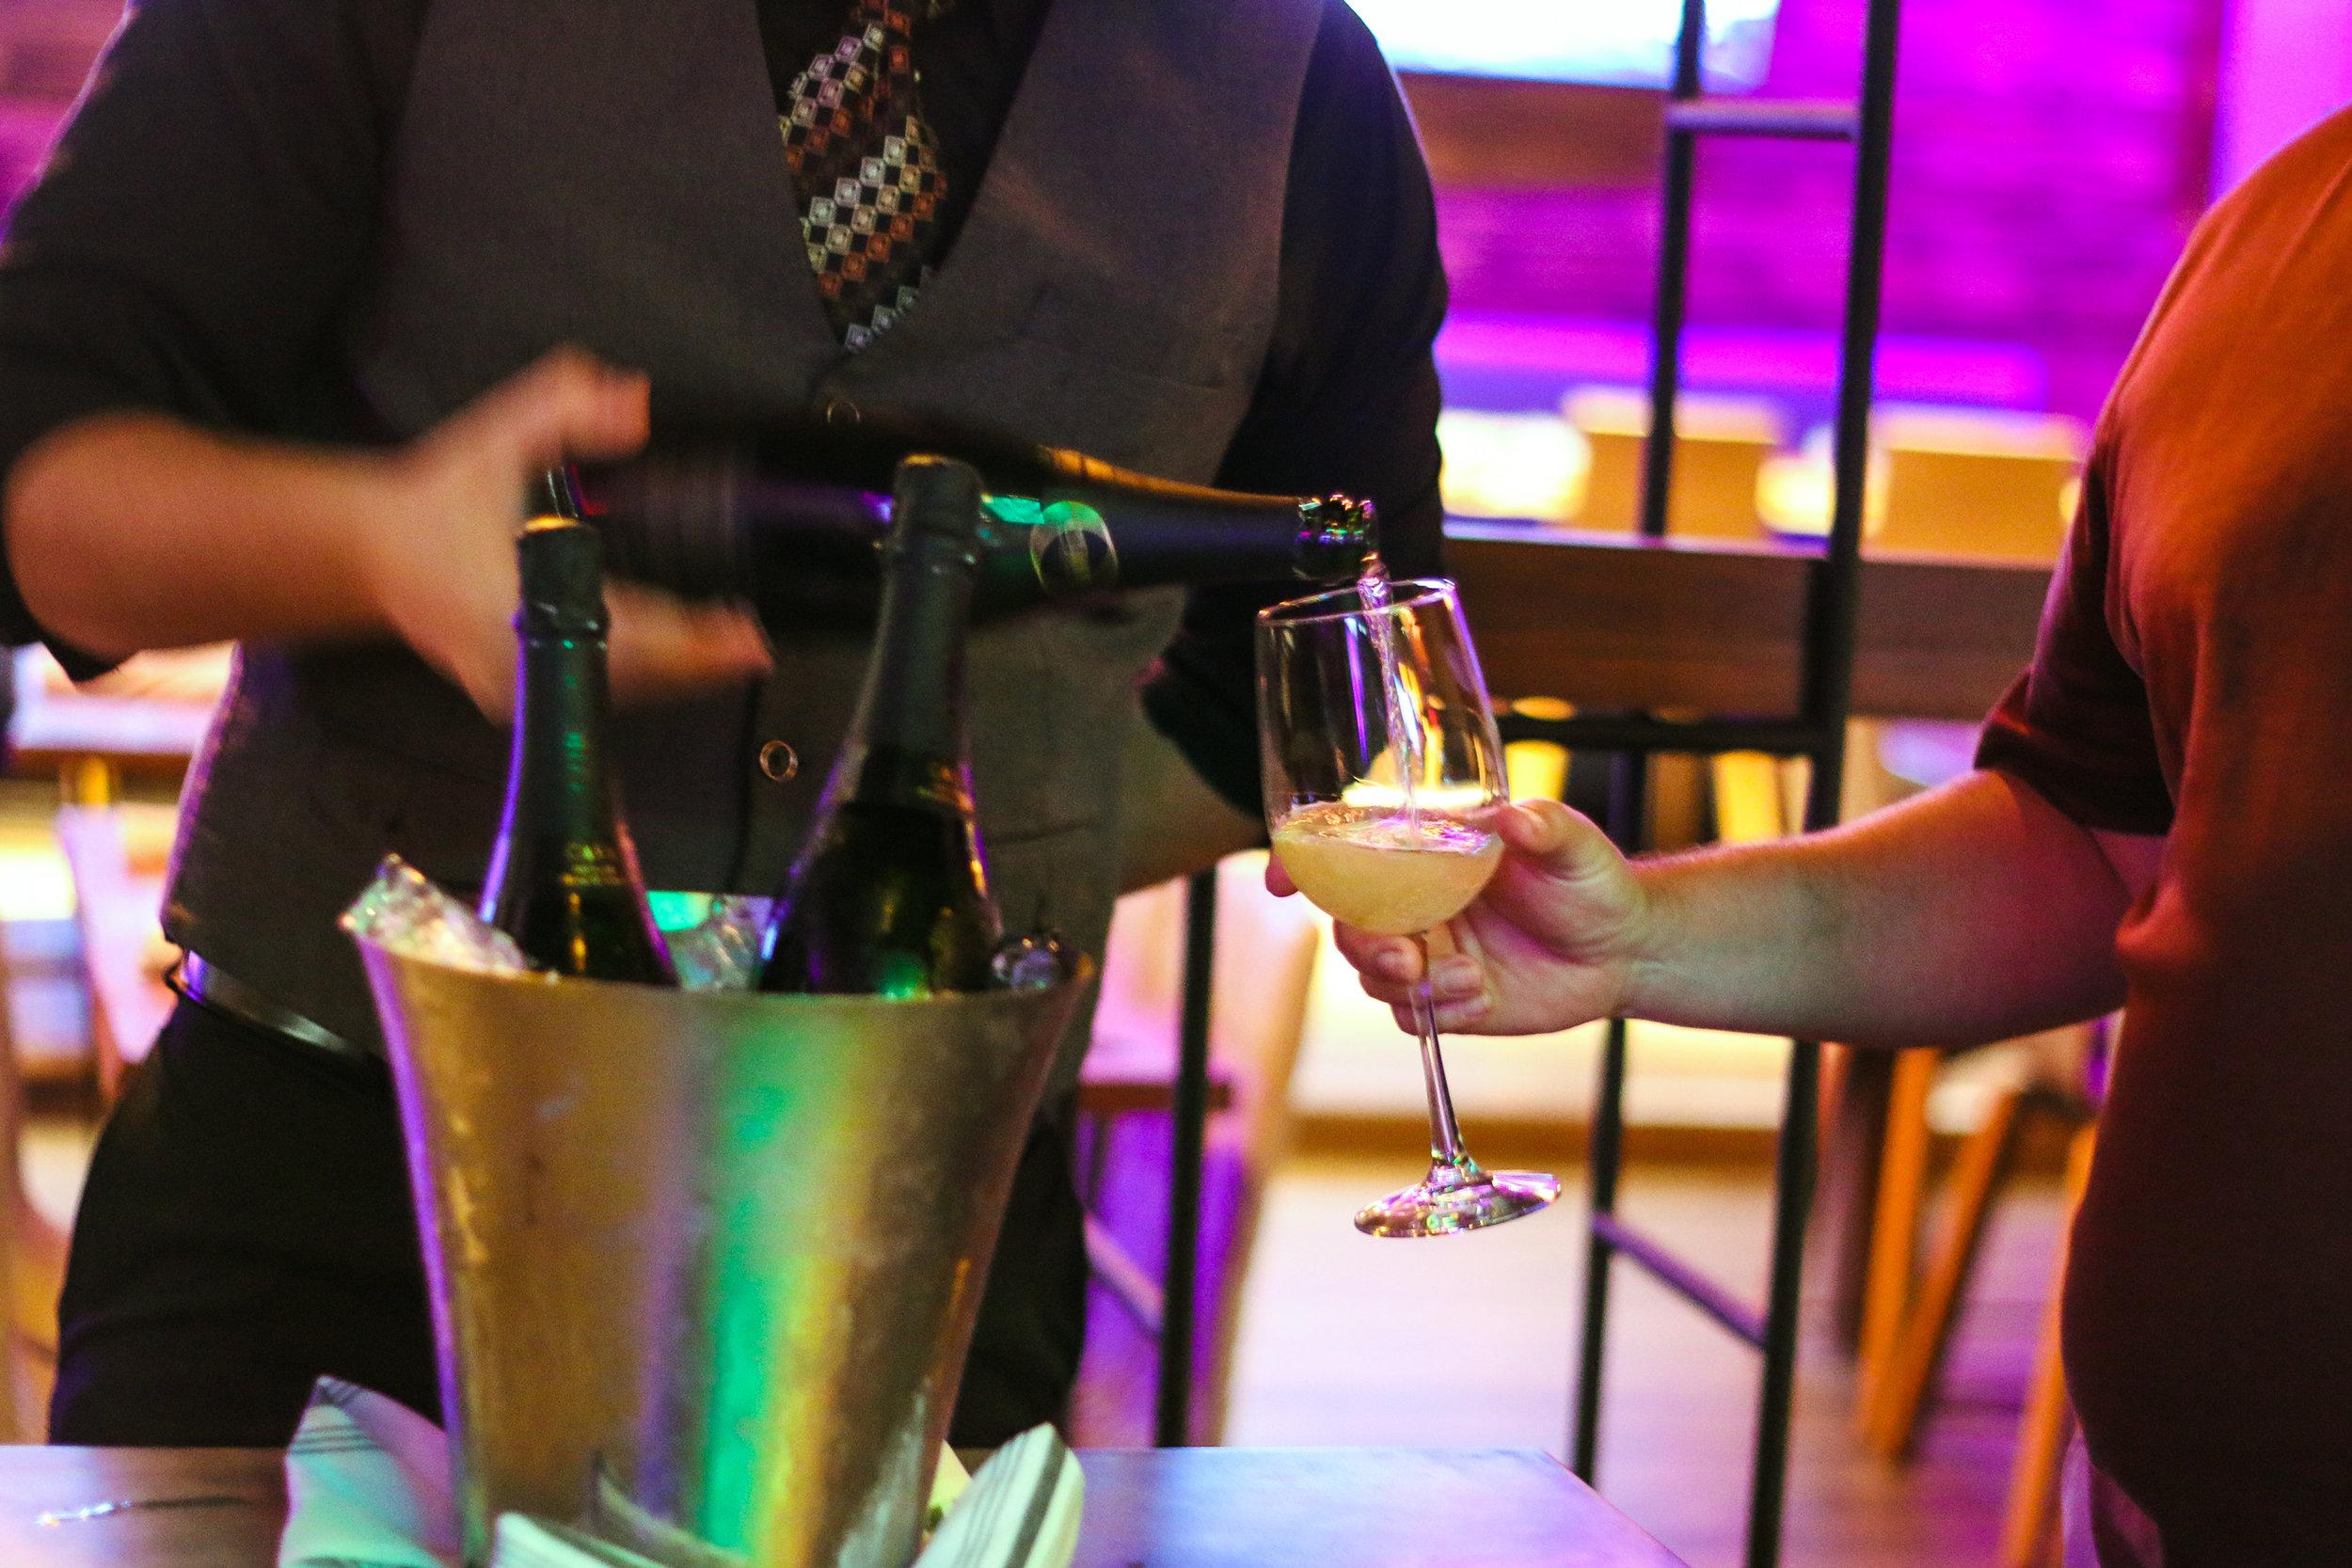 Cork & Fork-320 Gastrolounge-Miami Wine Events-Wine Tasting Miami-14.jpg